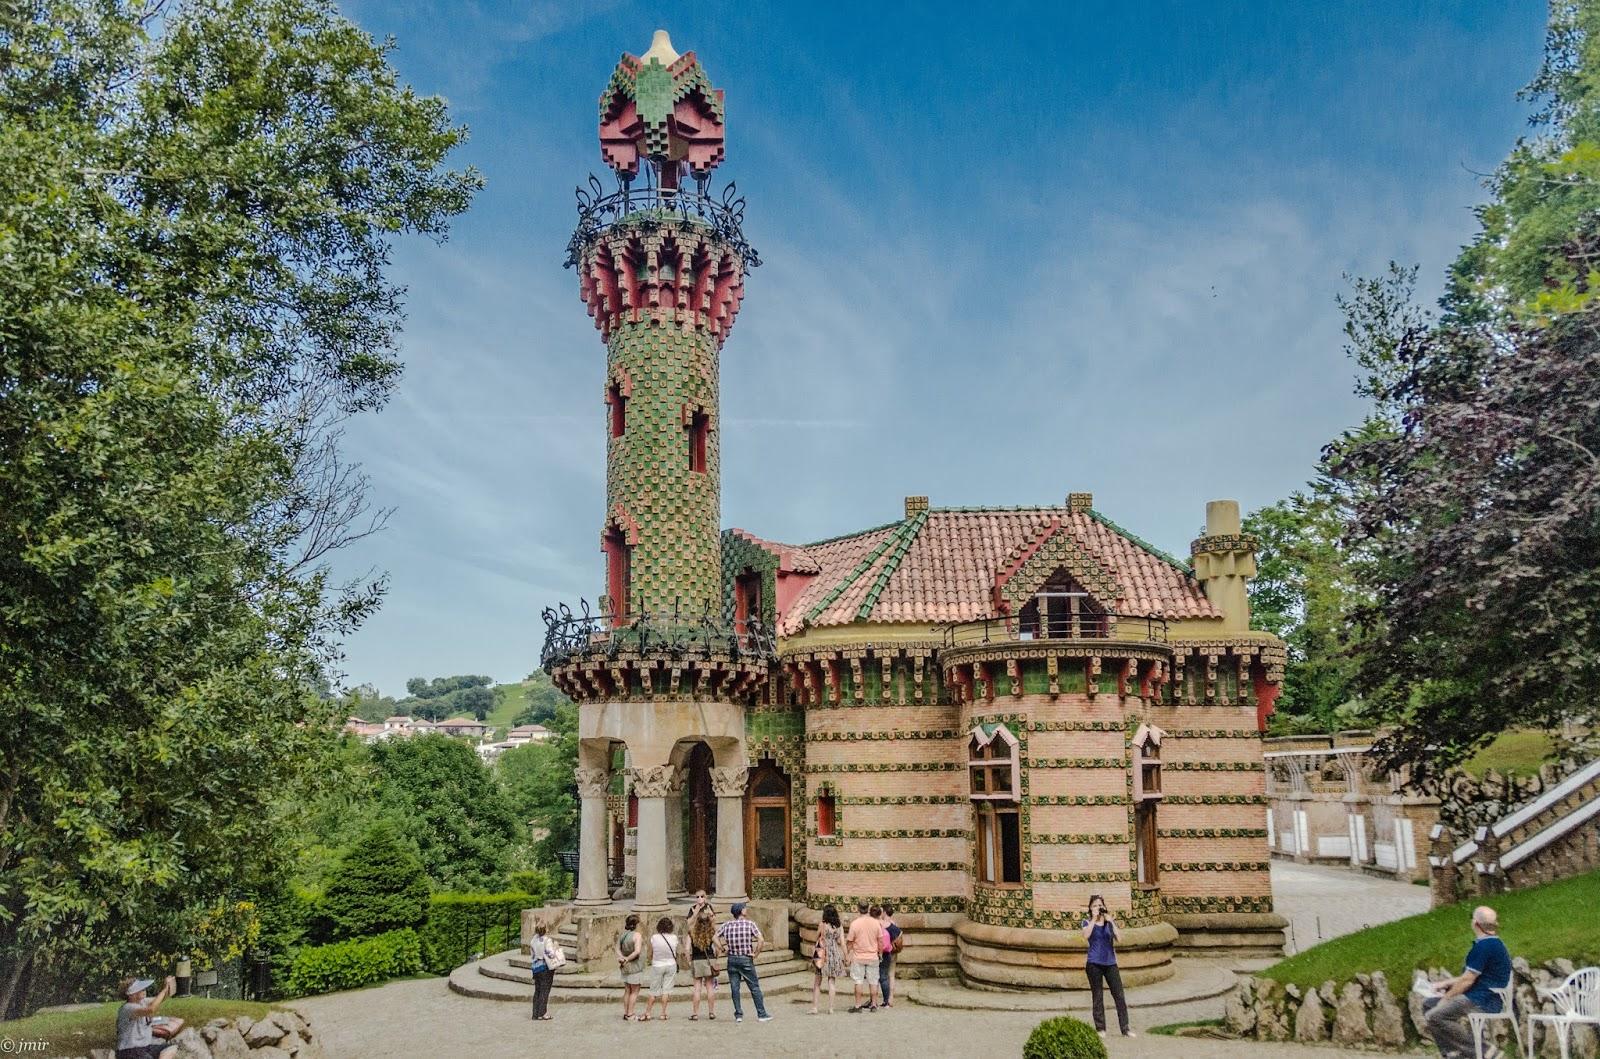 jmir: Capricho de Gaudi